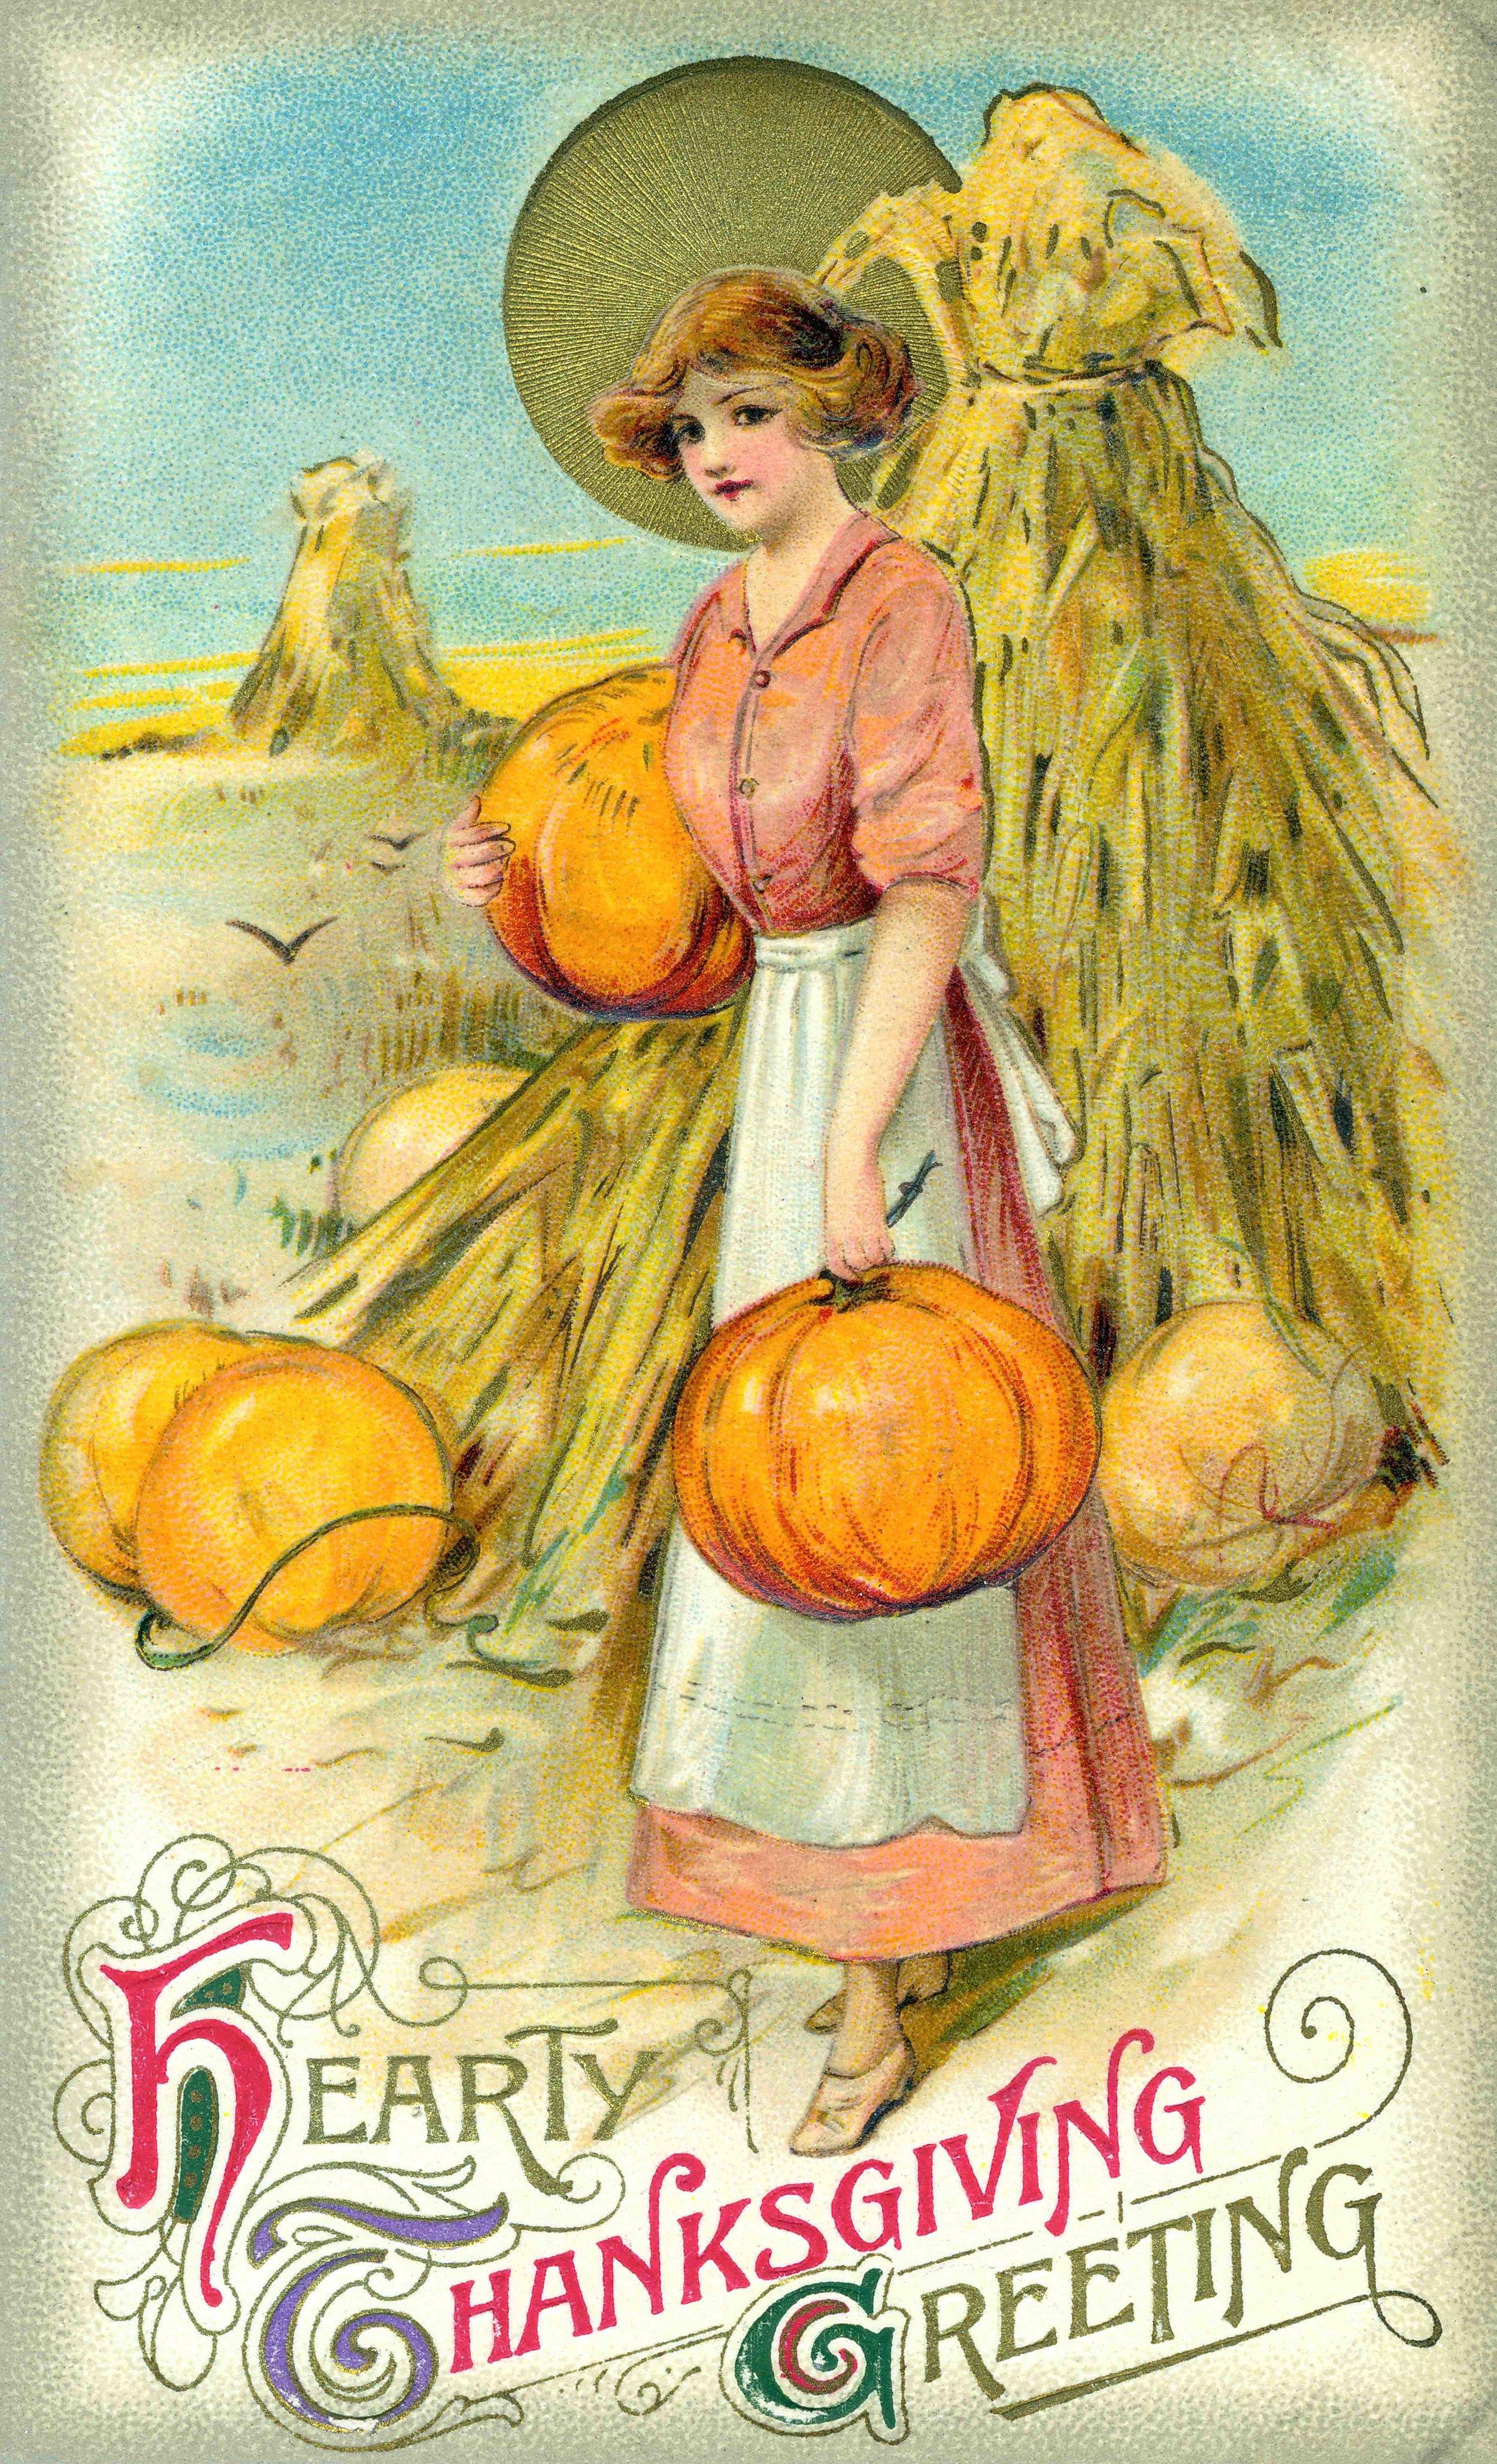 Hearty Thanksgiving Greeting.jpg